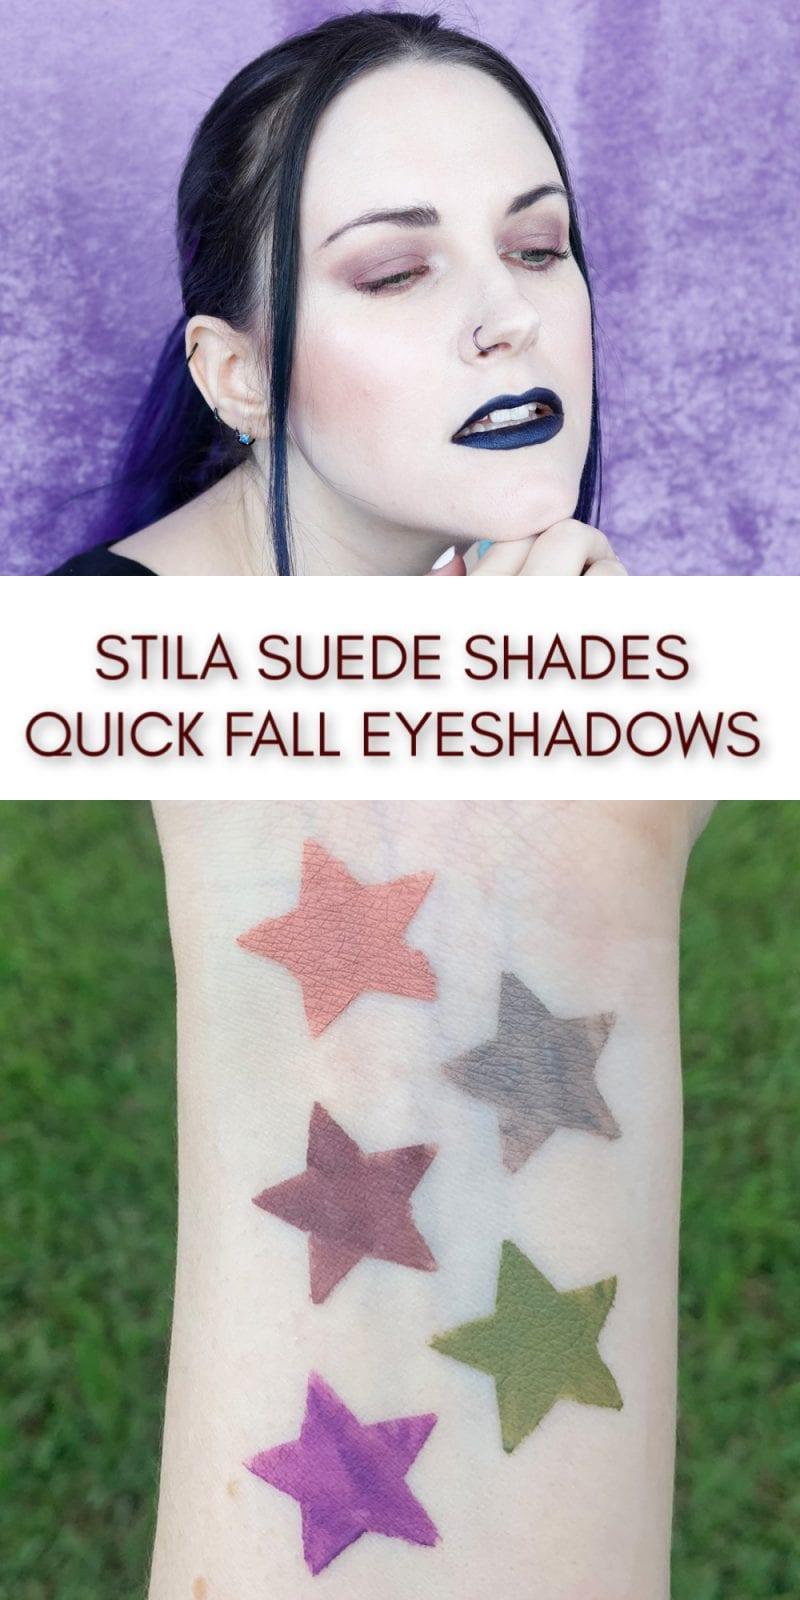 Stila Suede Shade Liquid Eye Shadows are Perfect for Fall